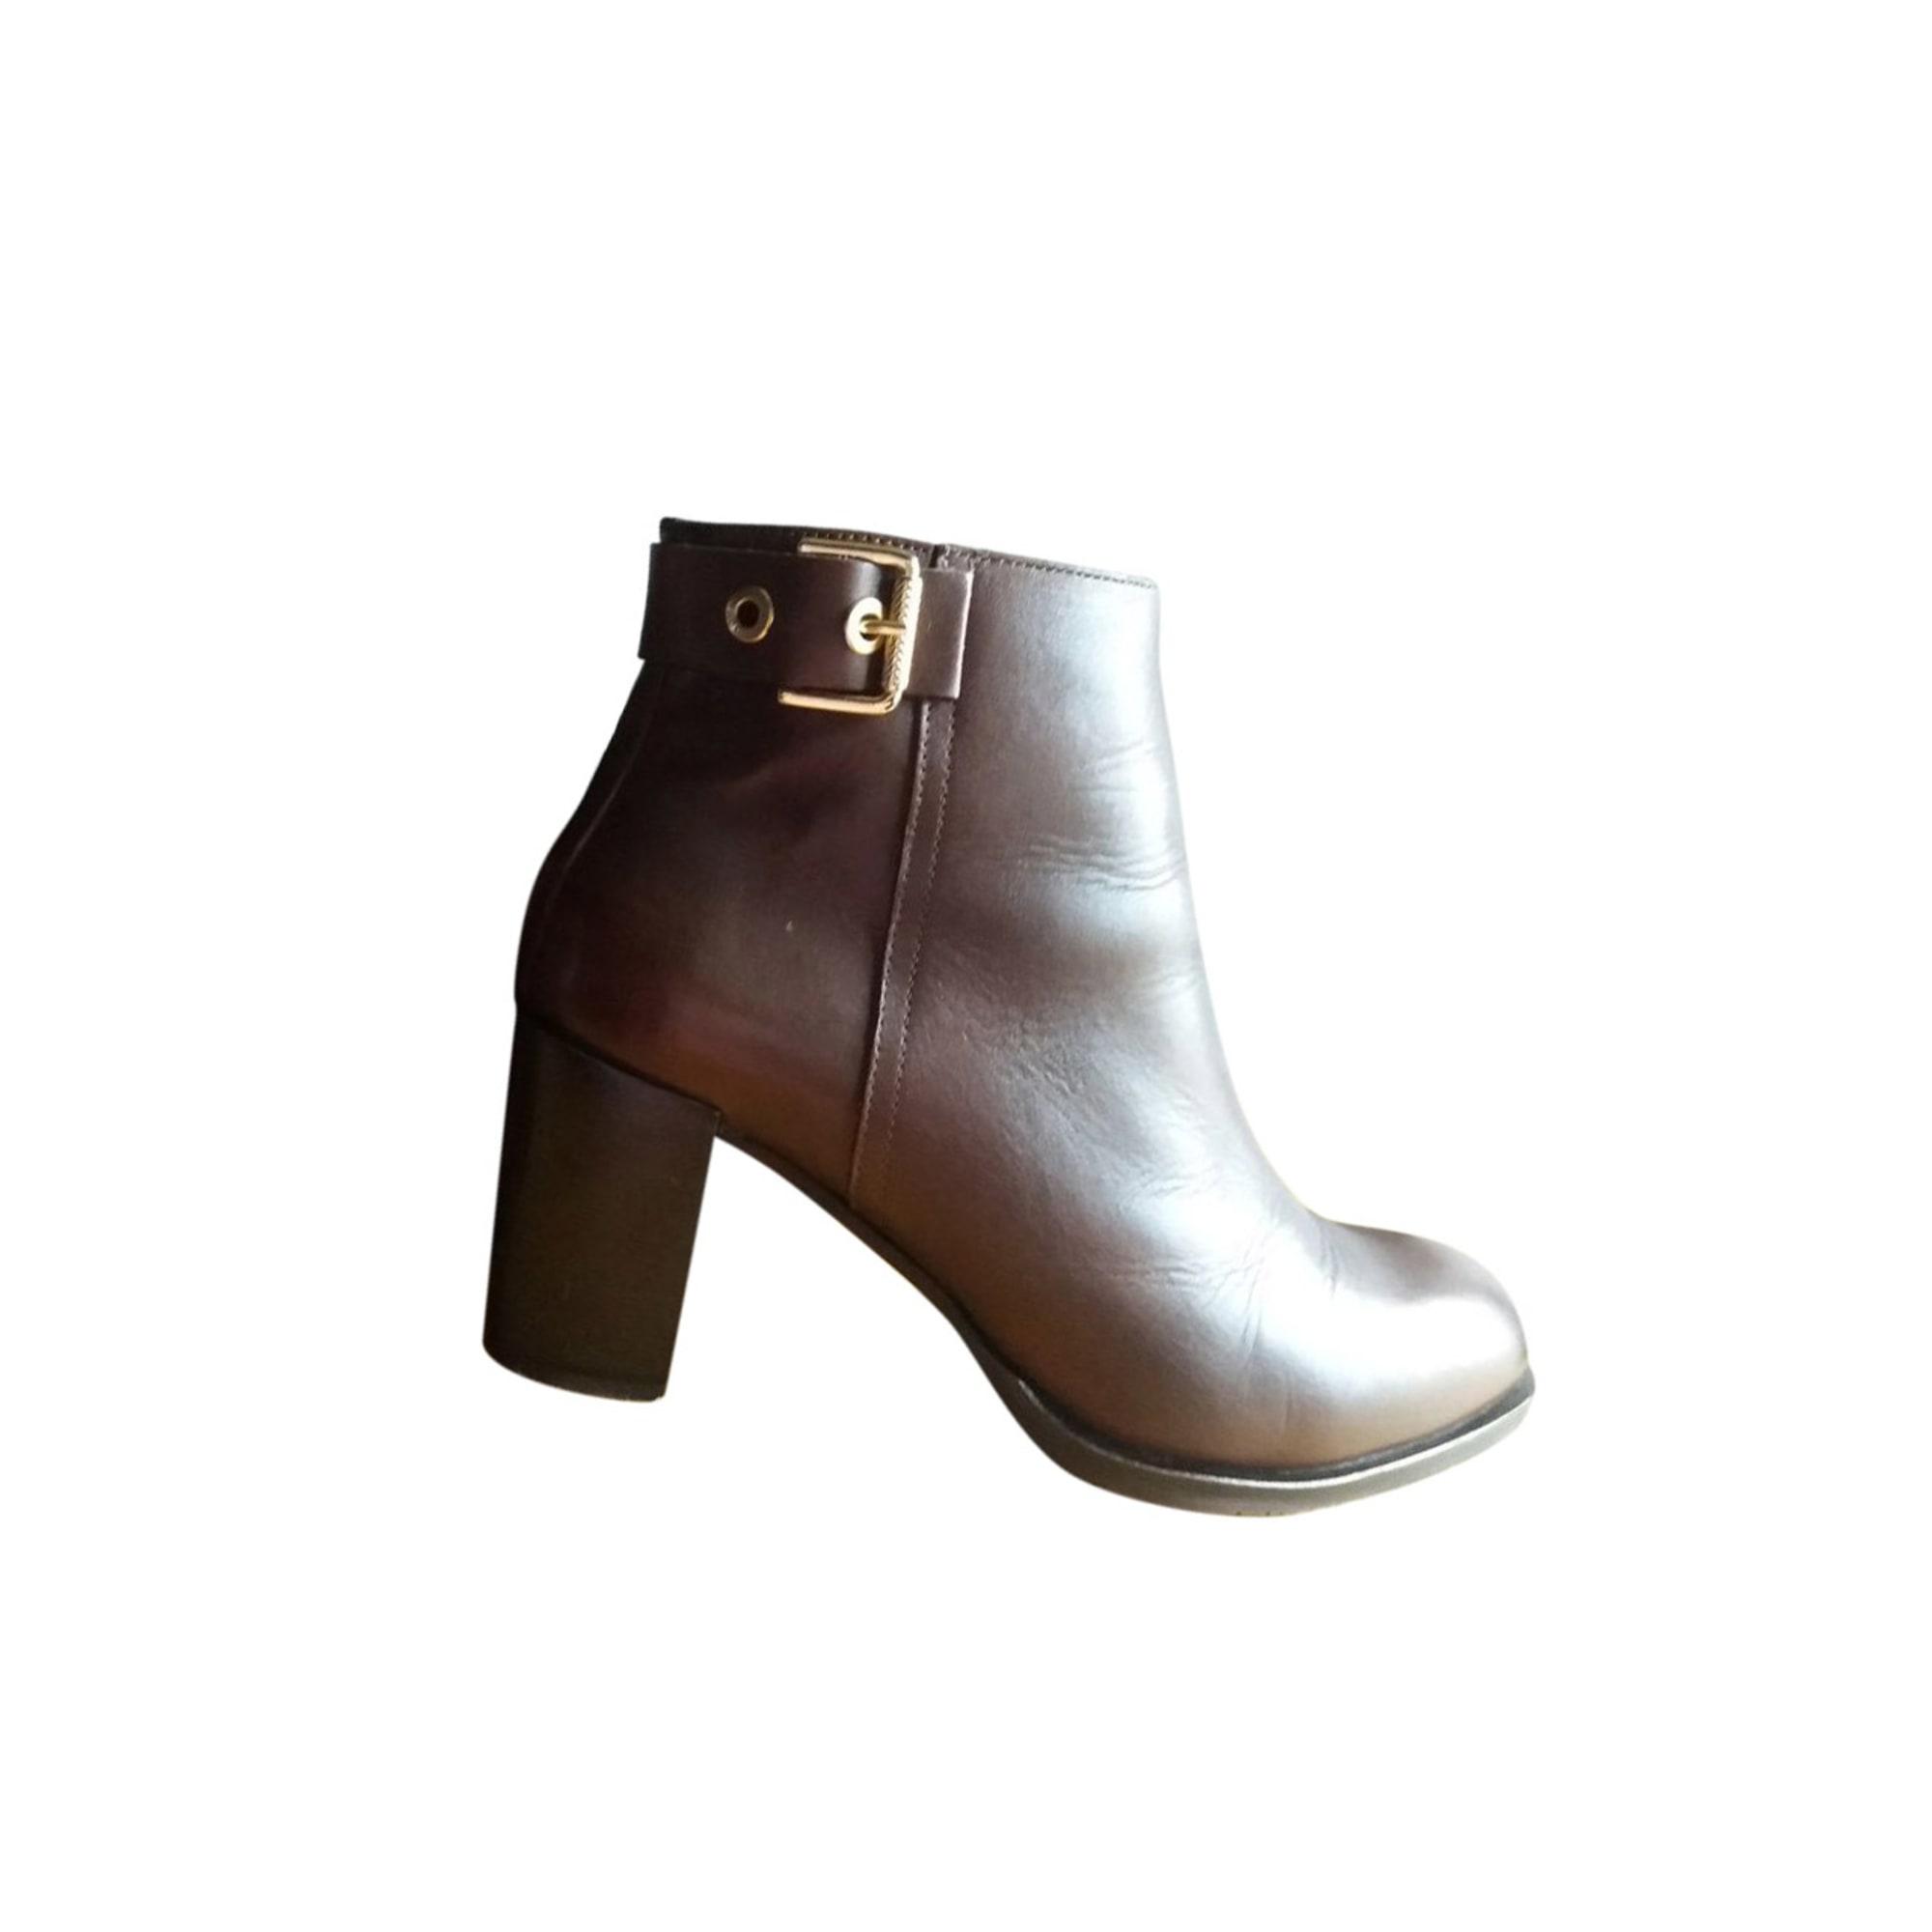 c3cf839ba9570d High Heel Ankle Boots TOMMY HILFIGER 41 brown - 7938583